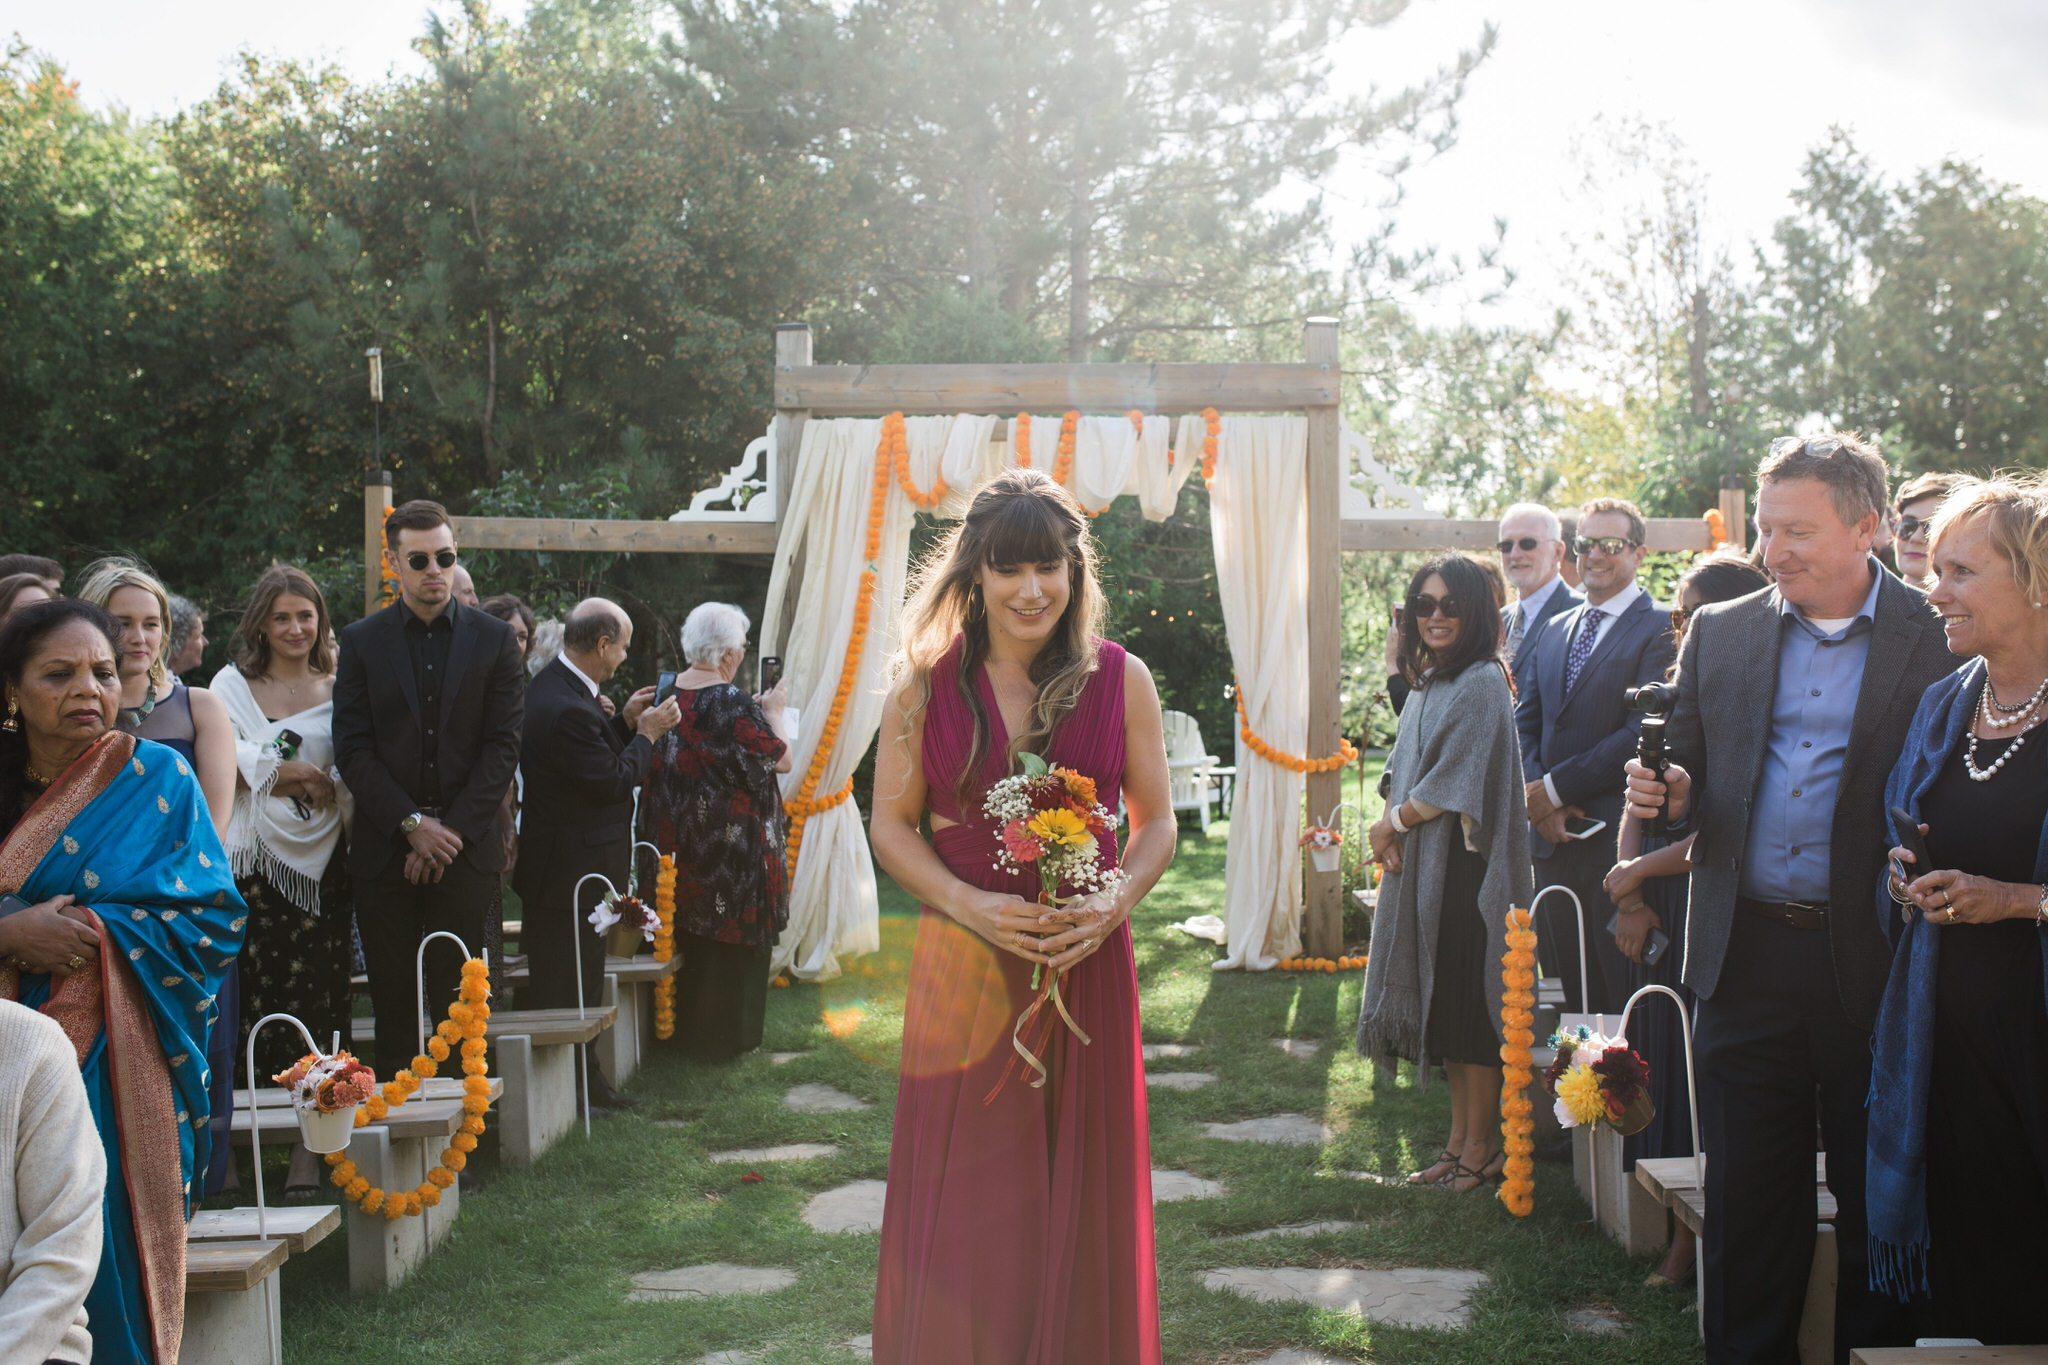 Northview Gardens Wedding - bridesmaid